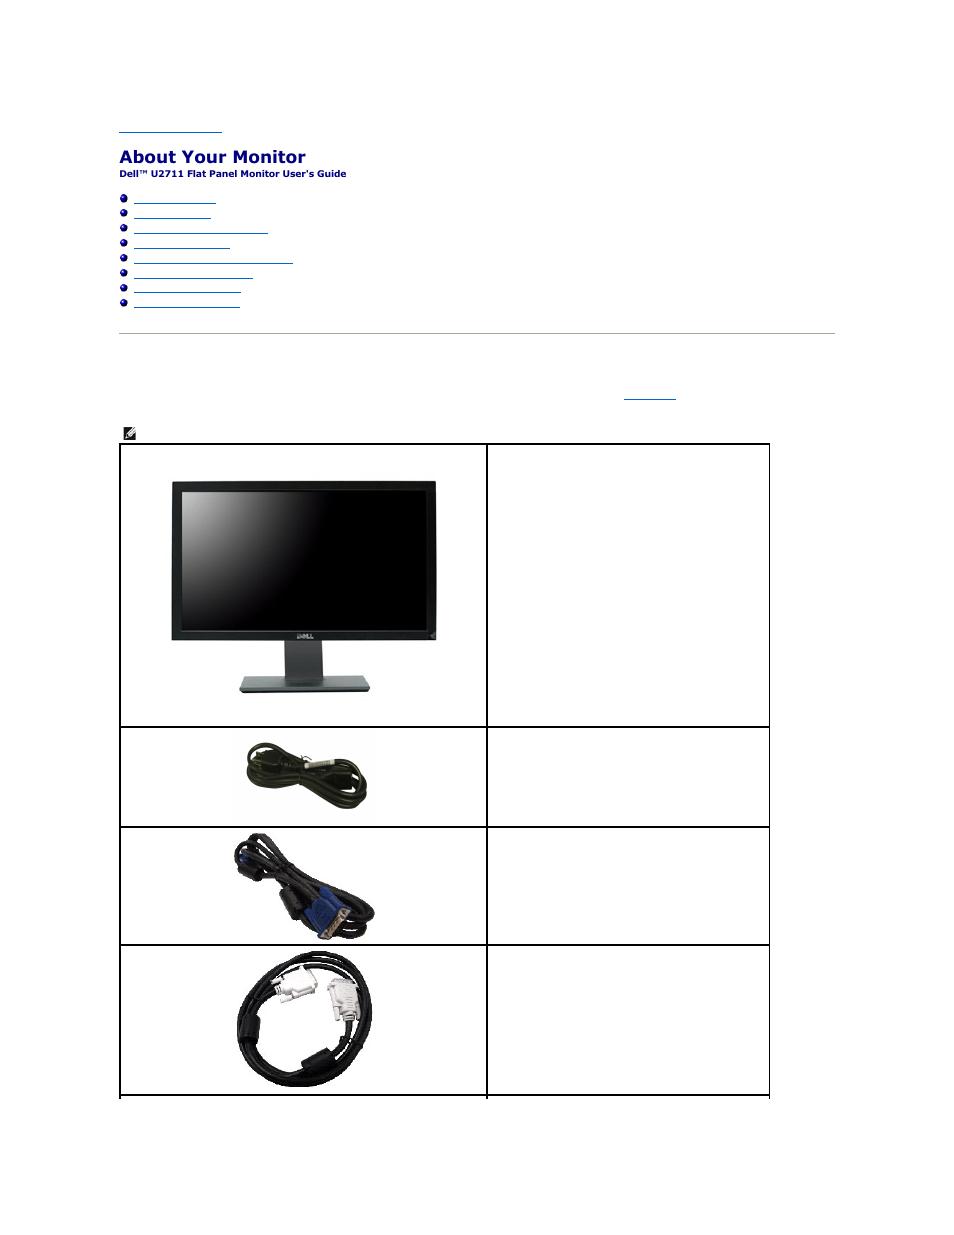 dell ultrasharp u2711 manual open source user manual u2022 rh dramatic varieties com Dell Widescreen Monitor Dell U2711 Firmware